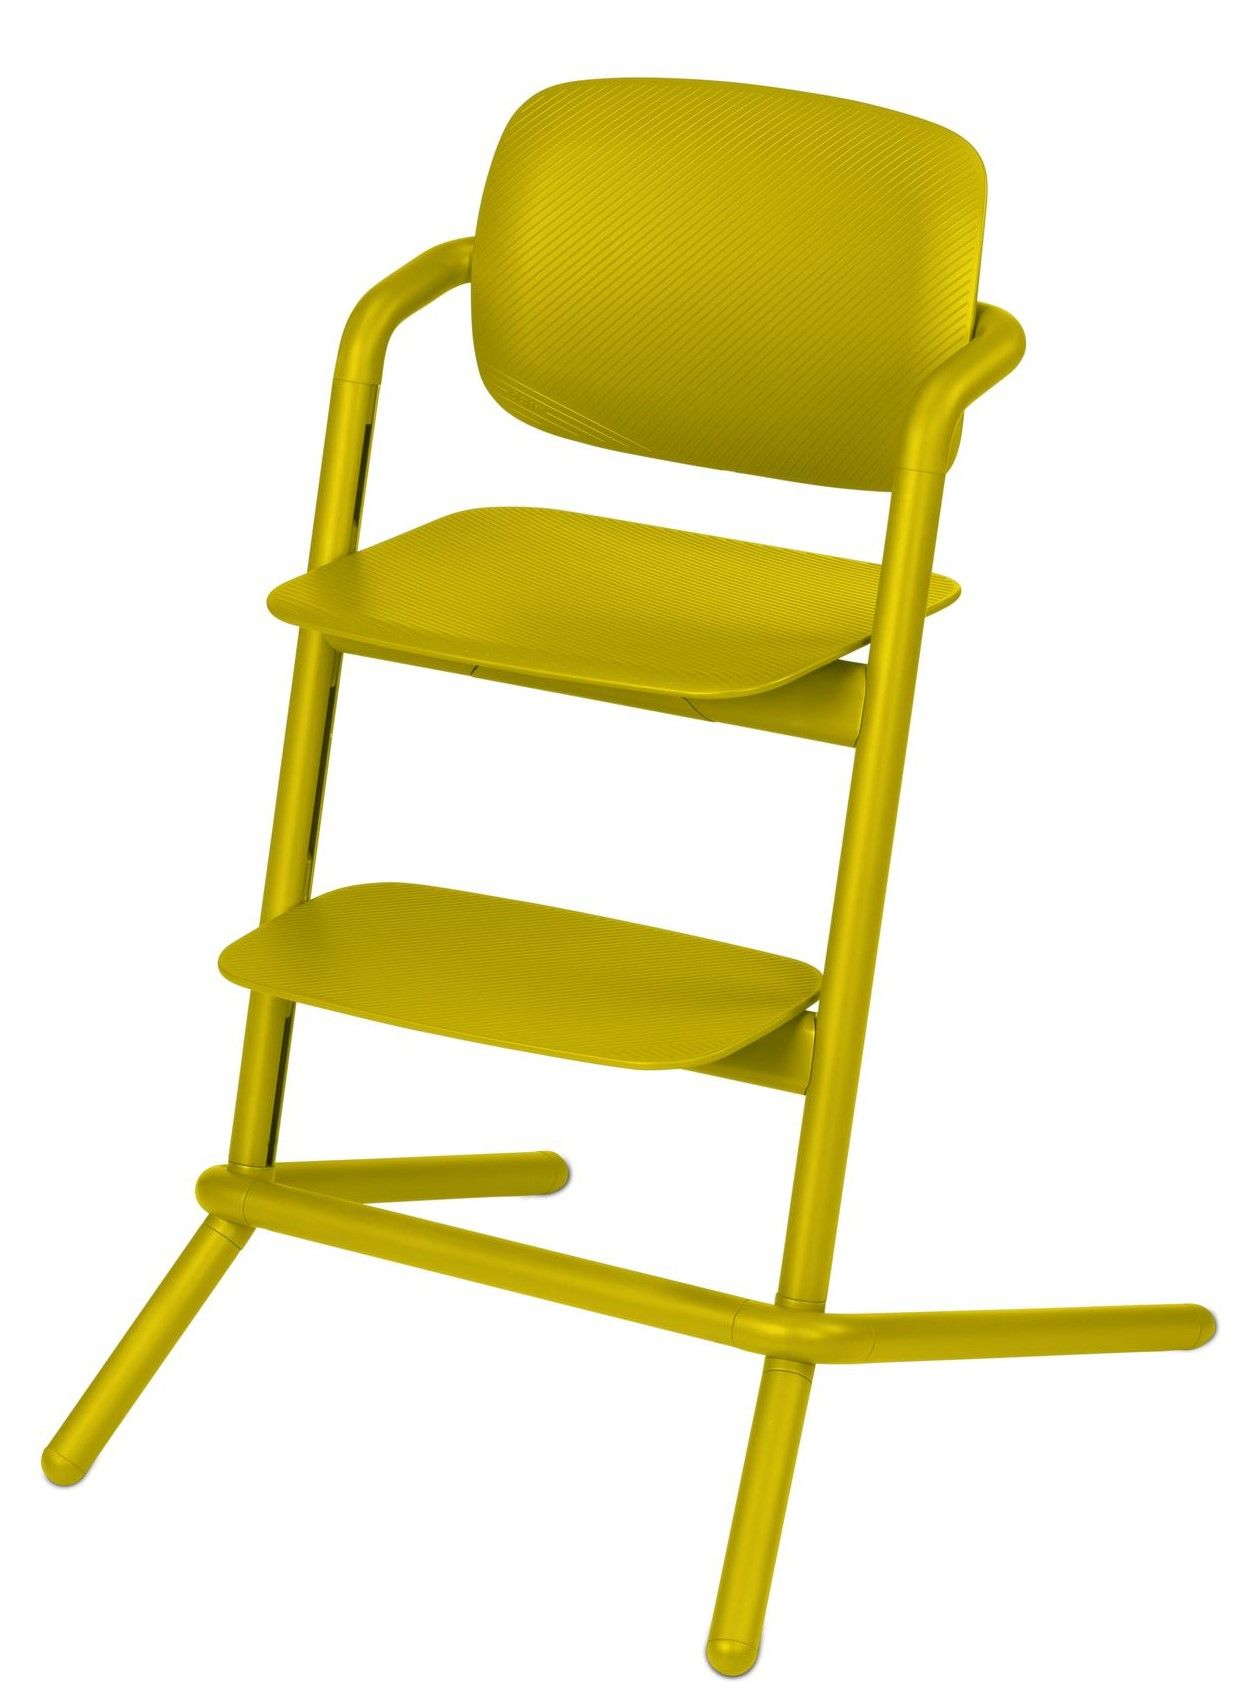 Cybex Lemo Syöttötuoli, Canary Yellow